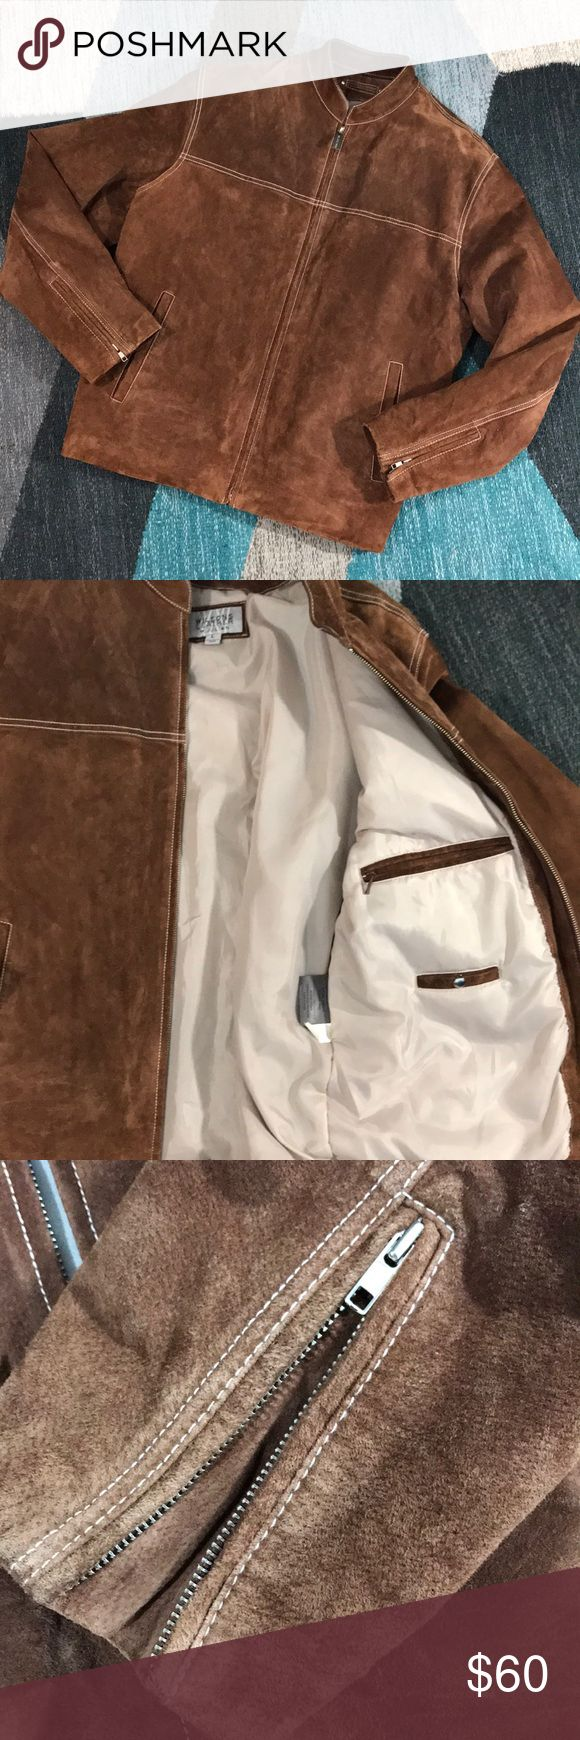 JUST IN! Wilsons Leather 100 Suede Men's Jacket